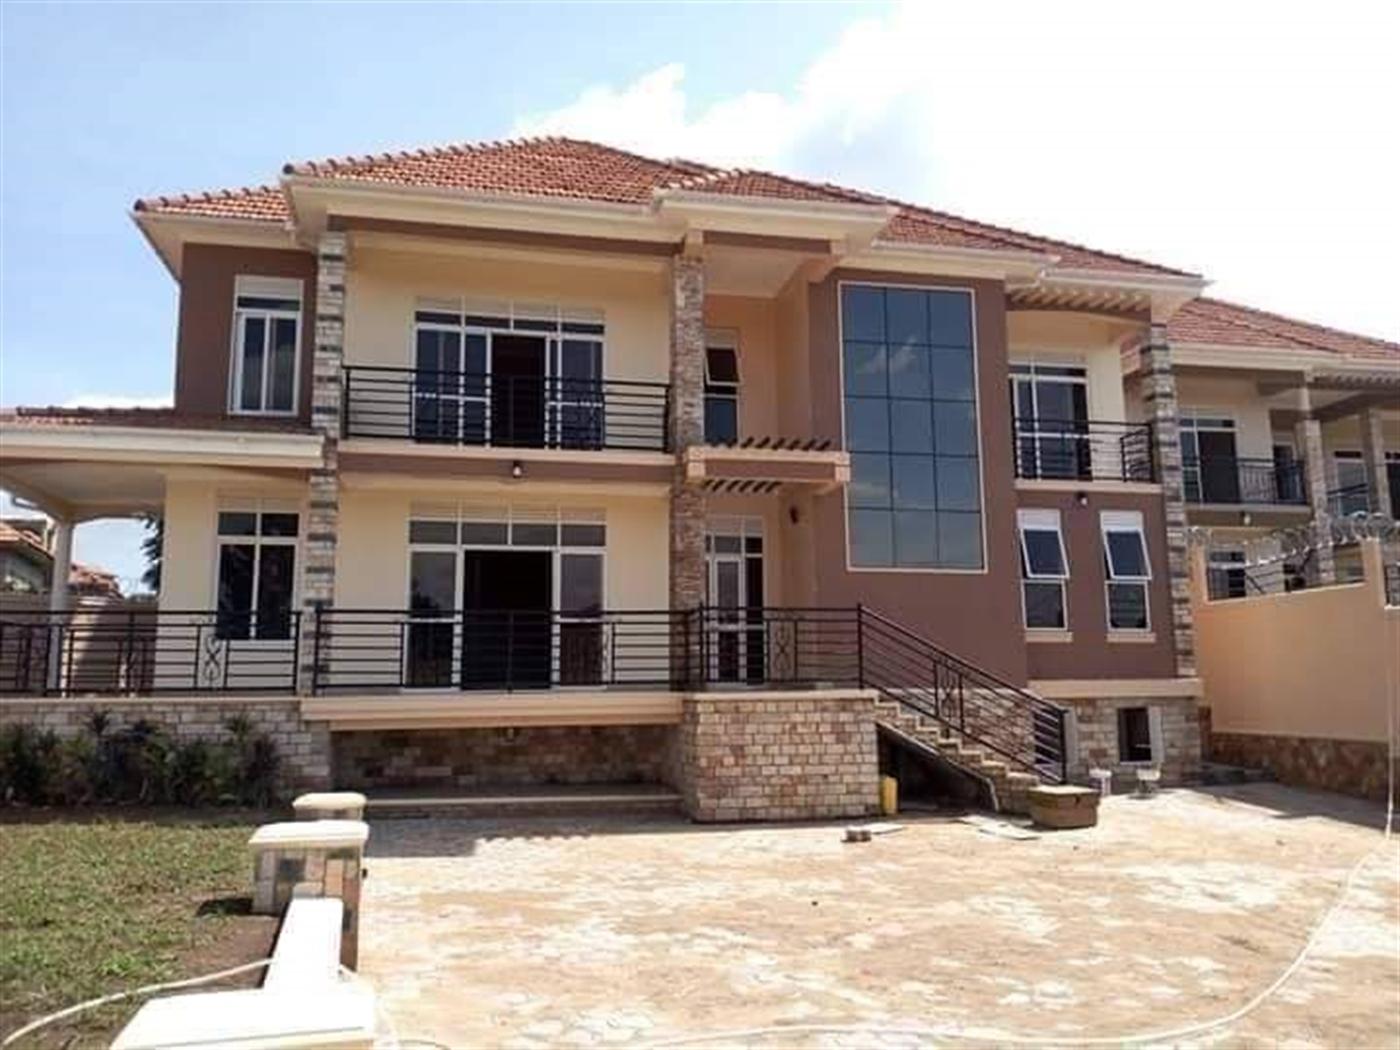 Mansion for sale in Munyonyo Wakiso